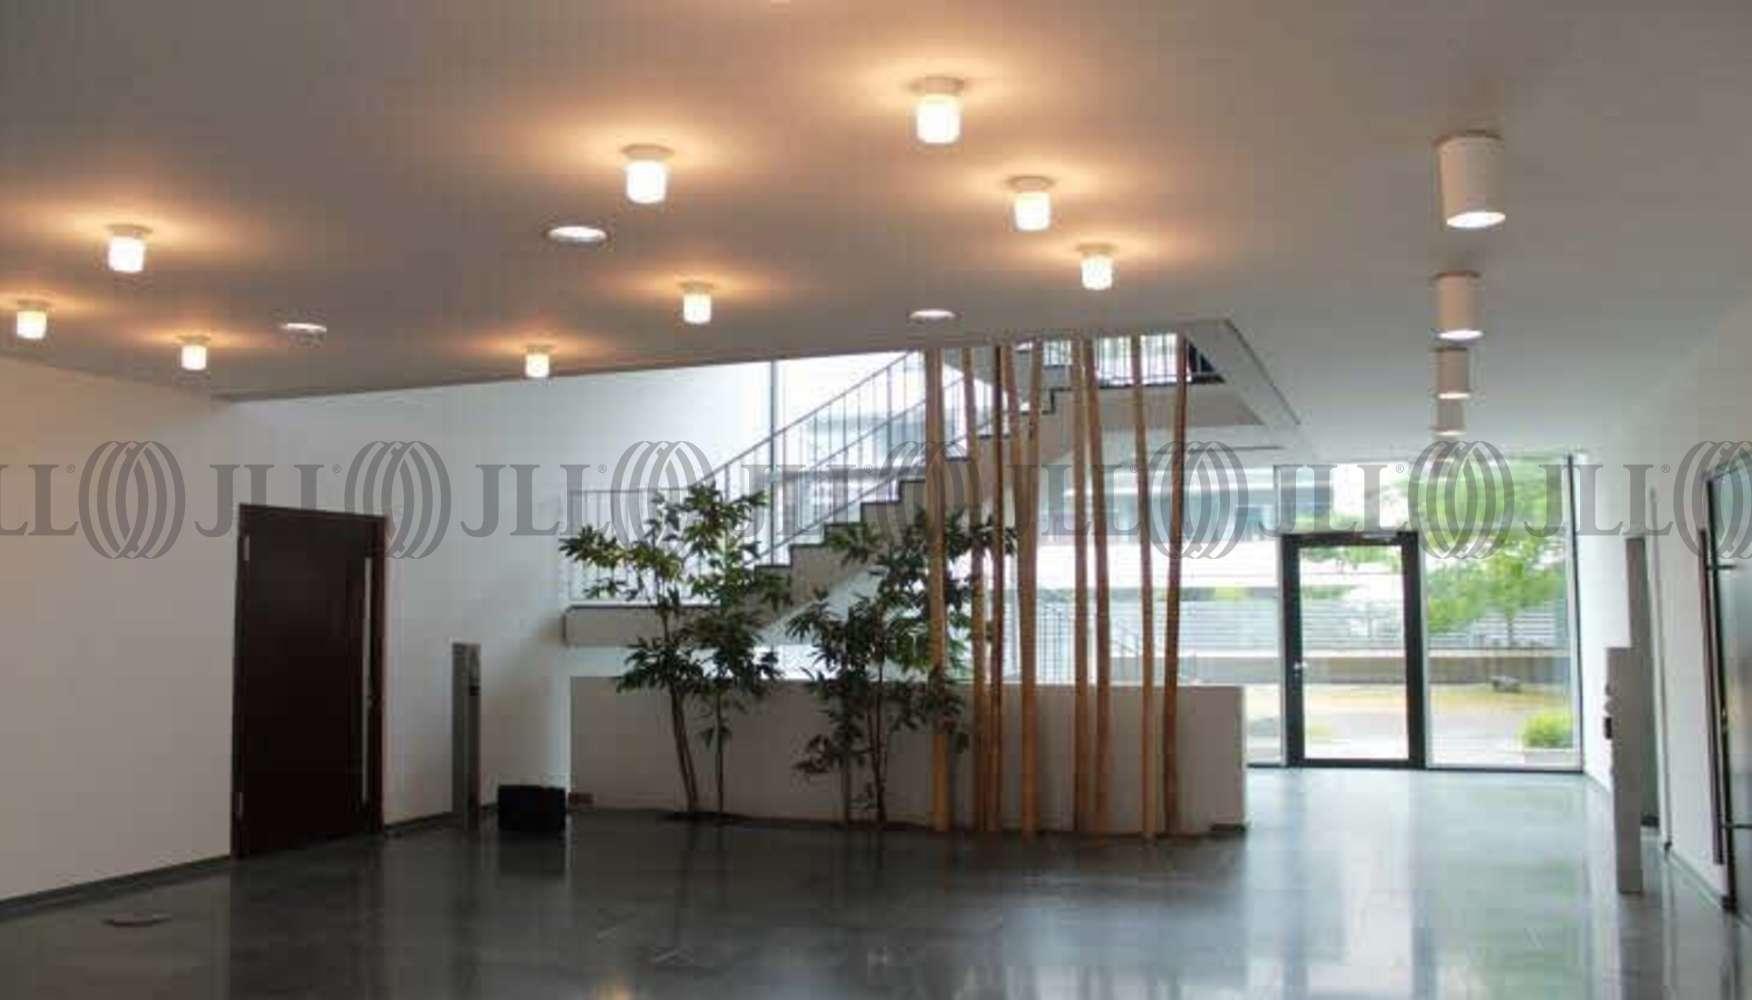 Büros Darmstadt, 64295 - Büro - Darmstadt - F1512 - 9580891